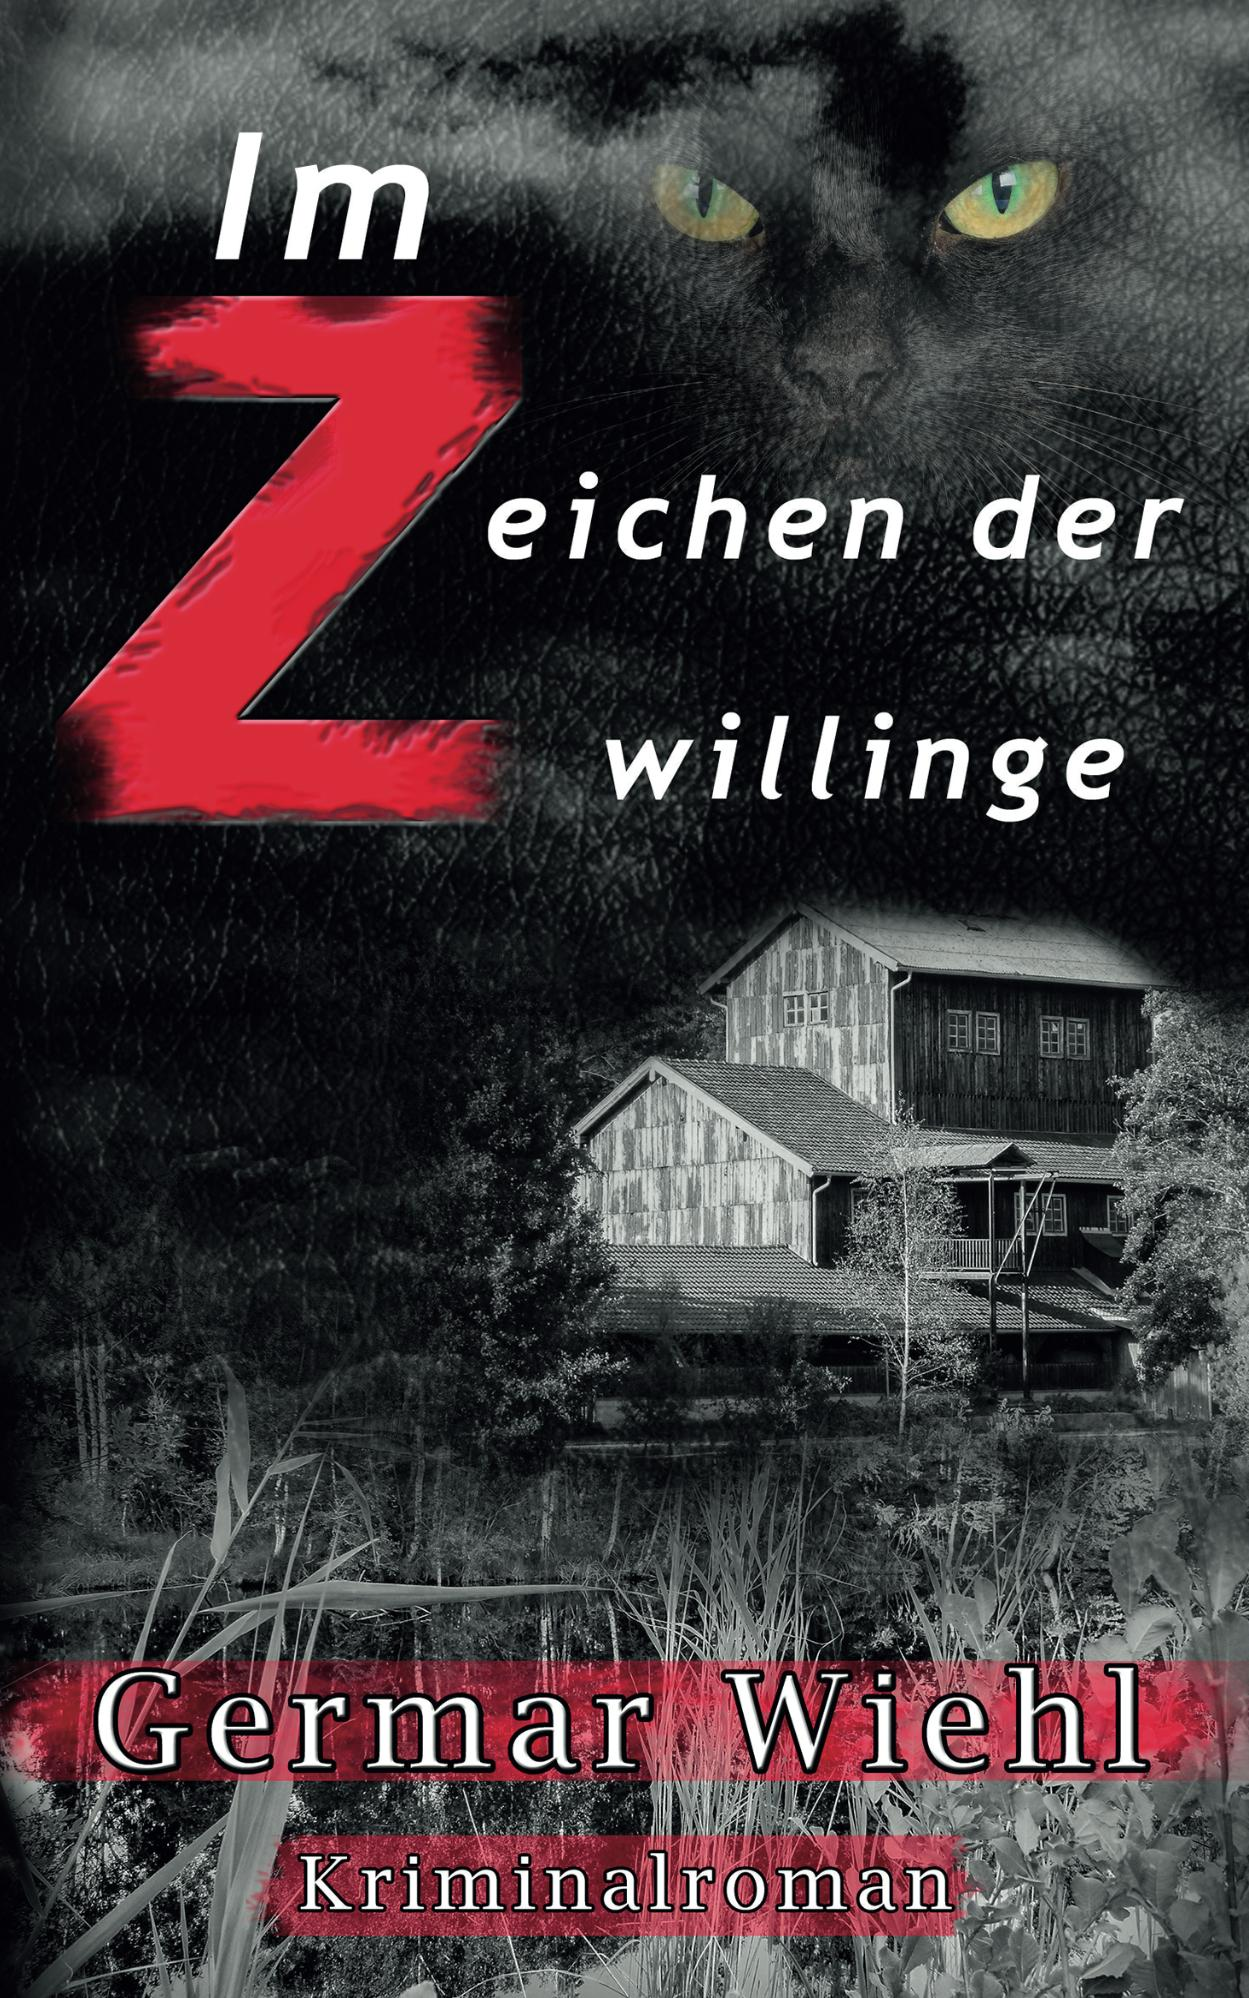 Im_Zeichen_der_Zwill_Cover_for_Kindle